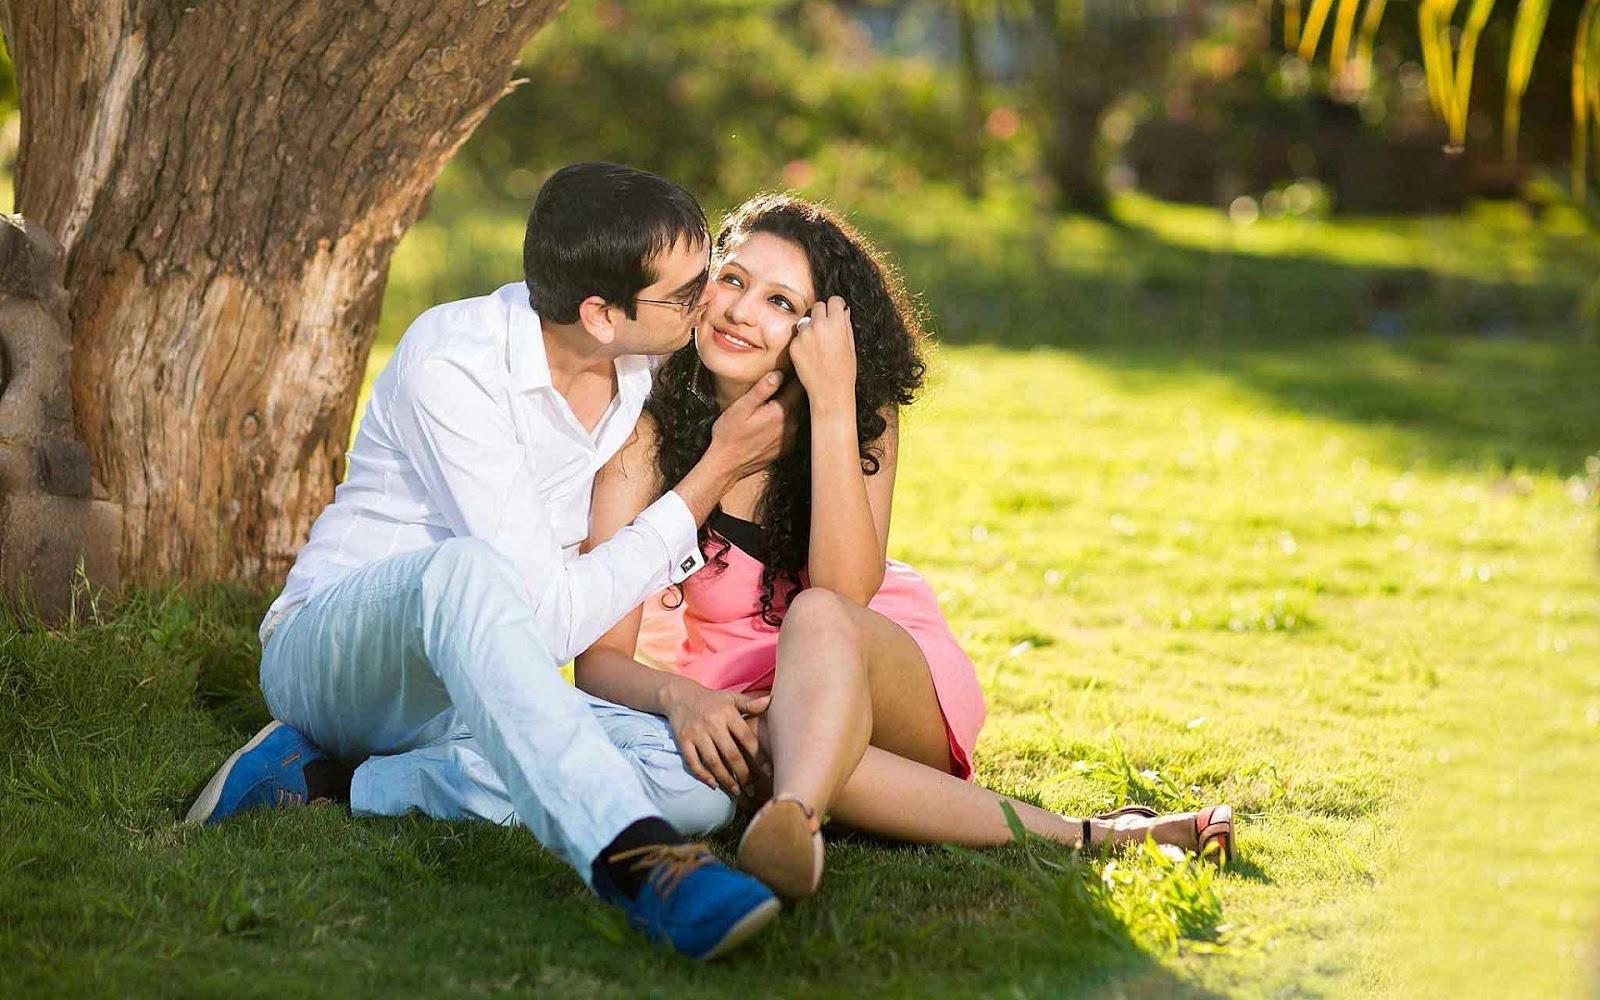 love couple kiss images   50+ romantic hd wallpapers, pics whatsapp